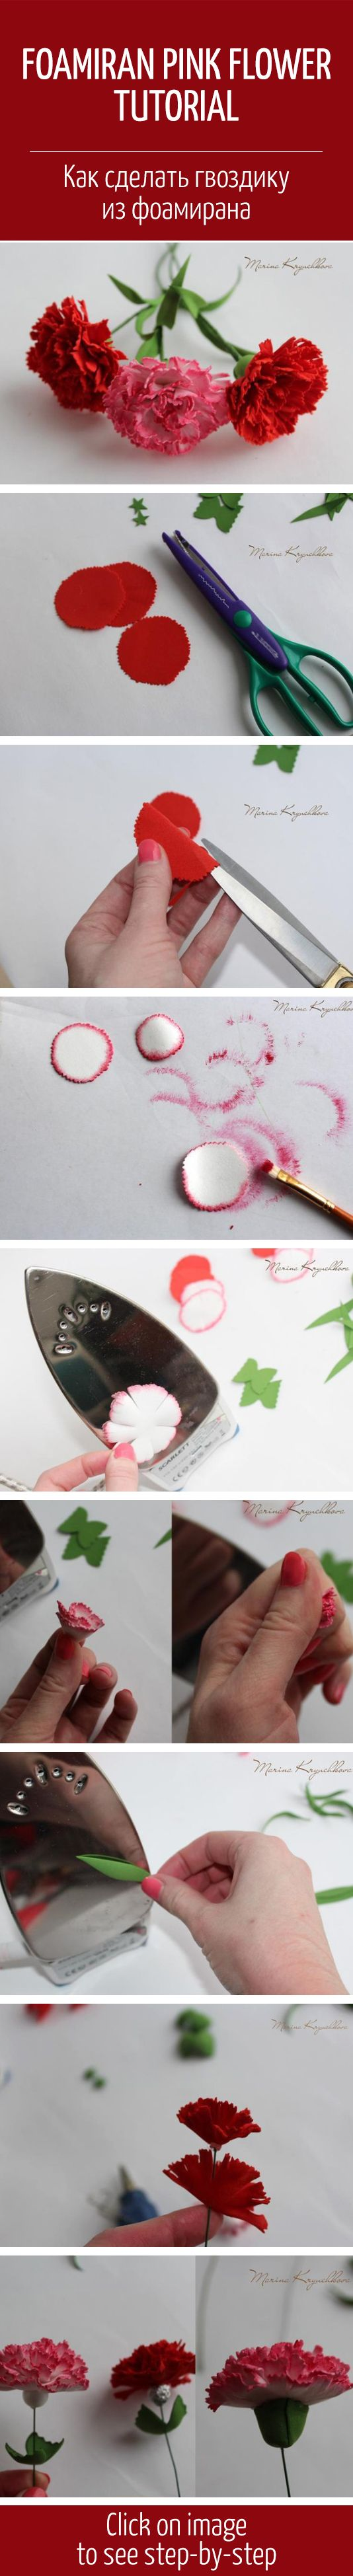 Foamiran Pink Flower Tutorial / Лепим цветок гвоздики из фоамирана